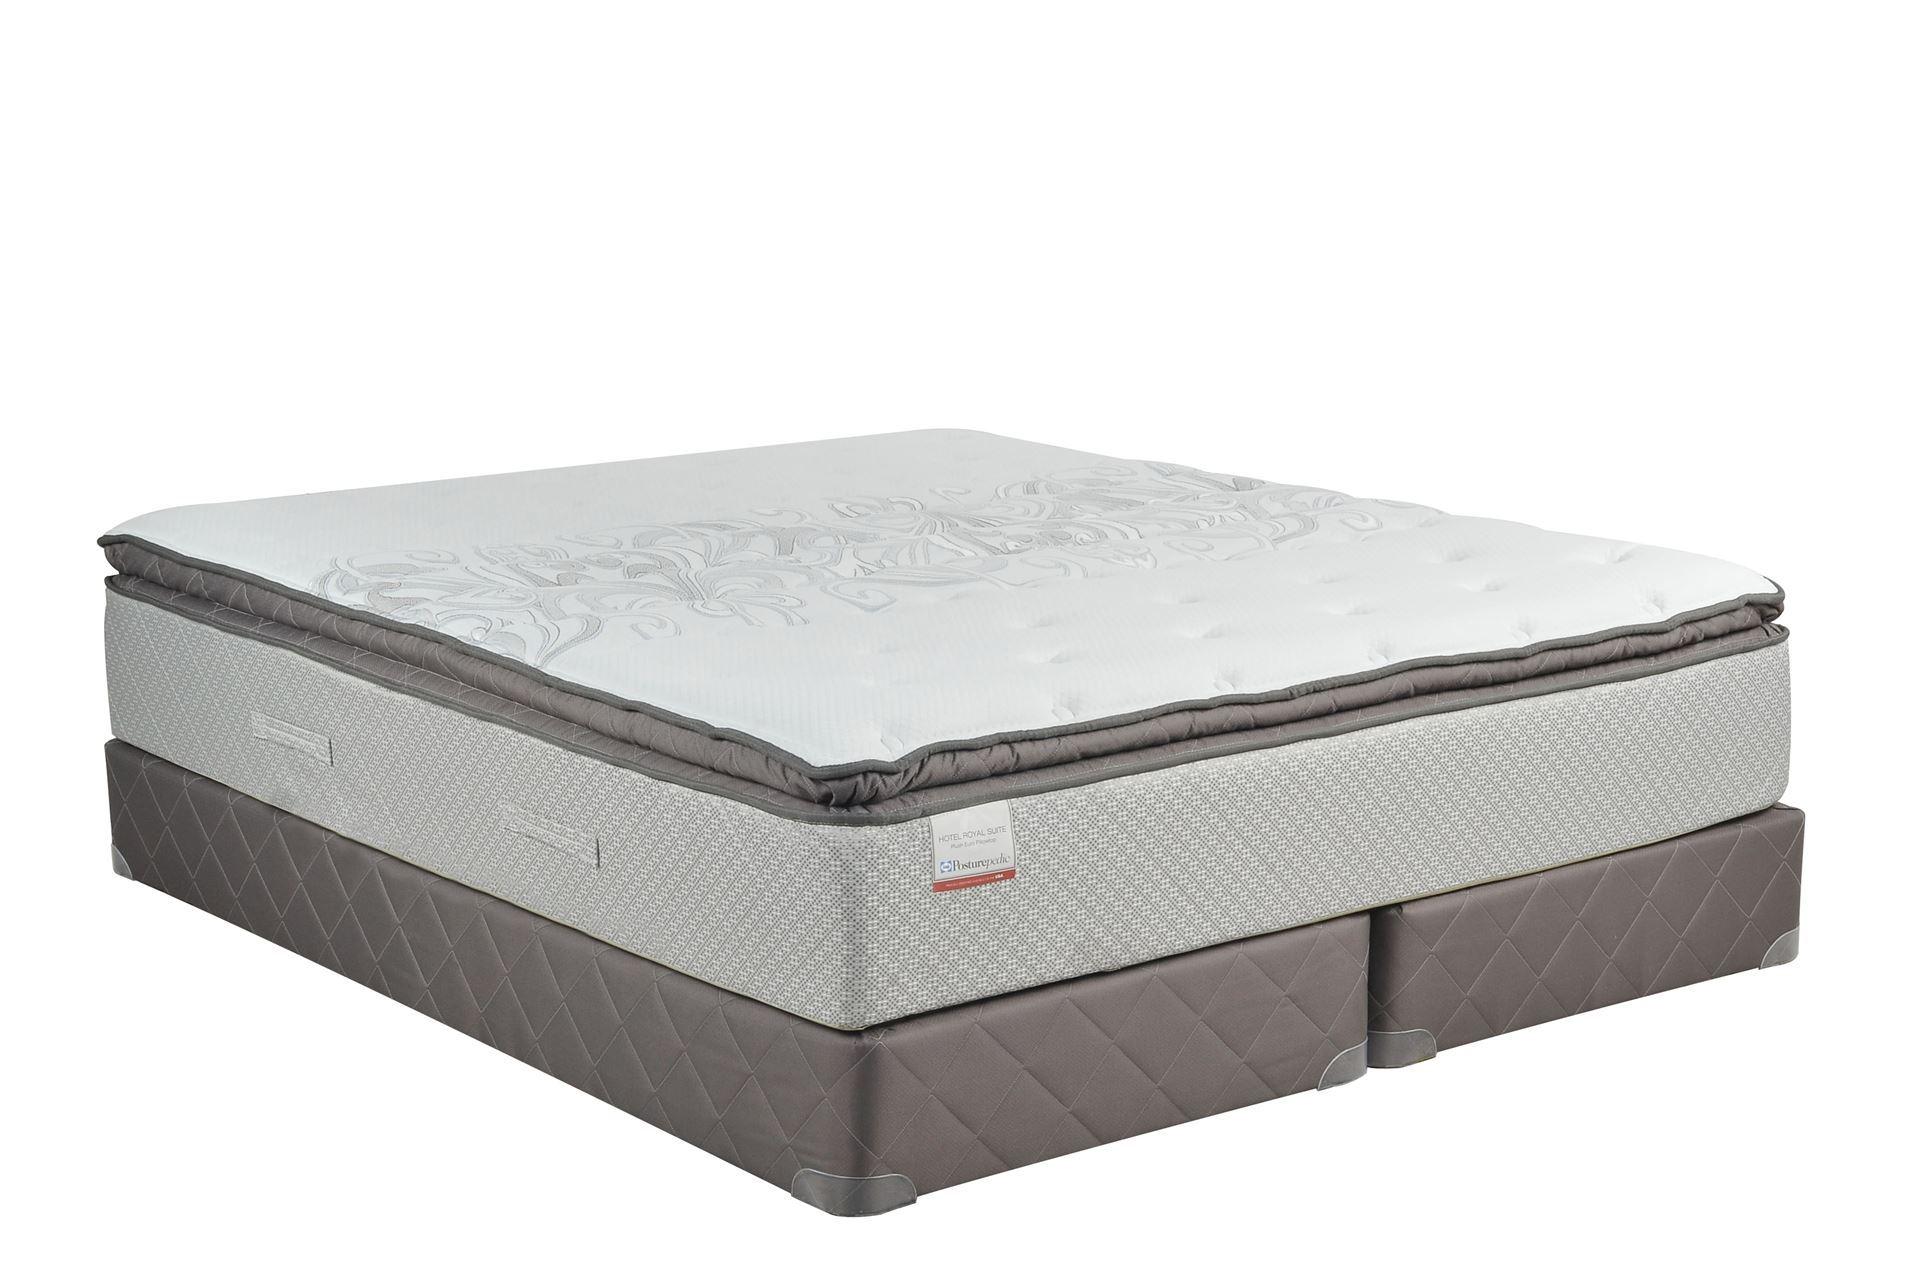 Royal Pedic Full Size Pillowtop Mattress W Box Spring